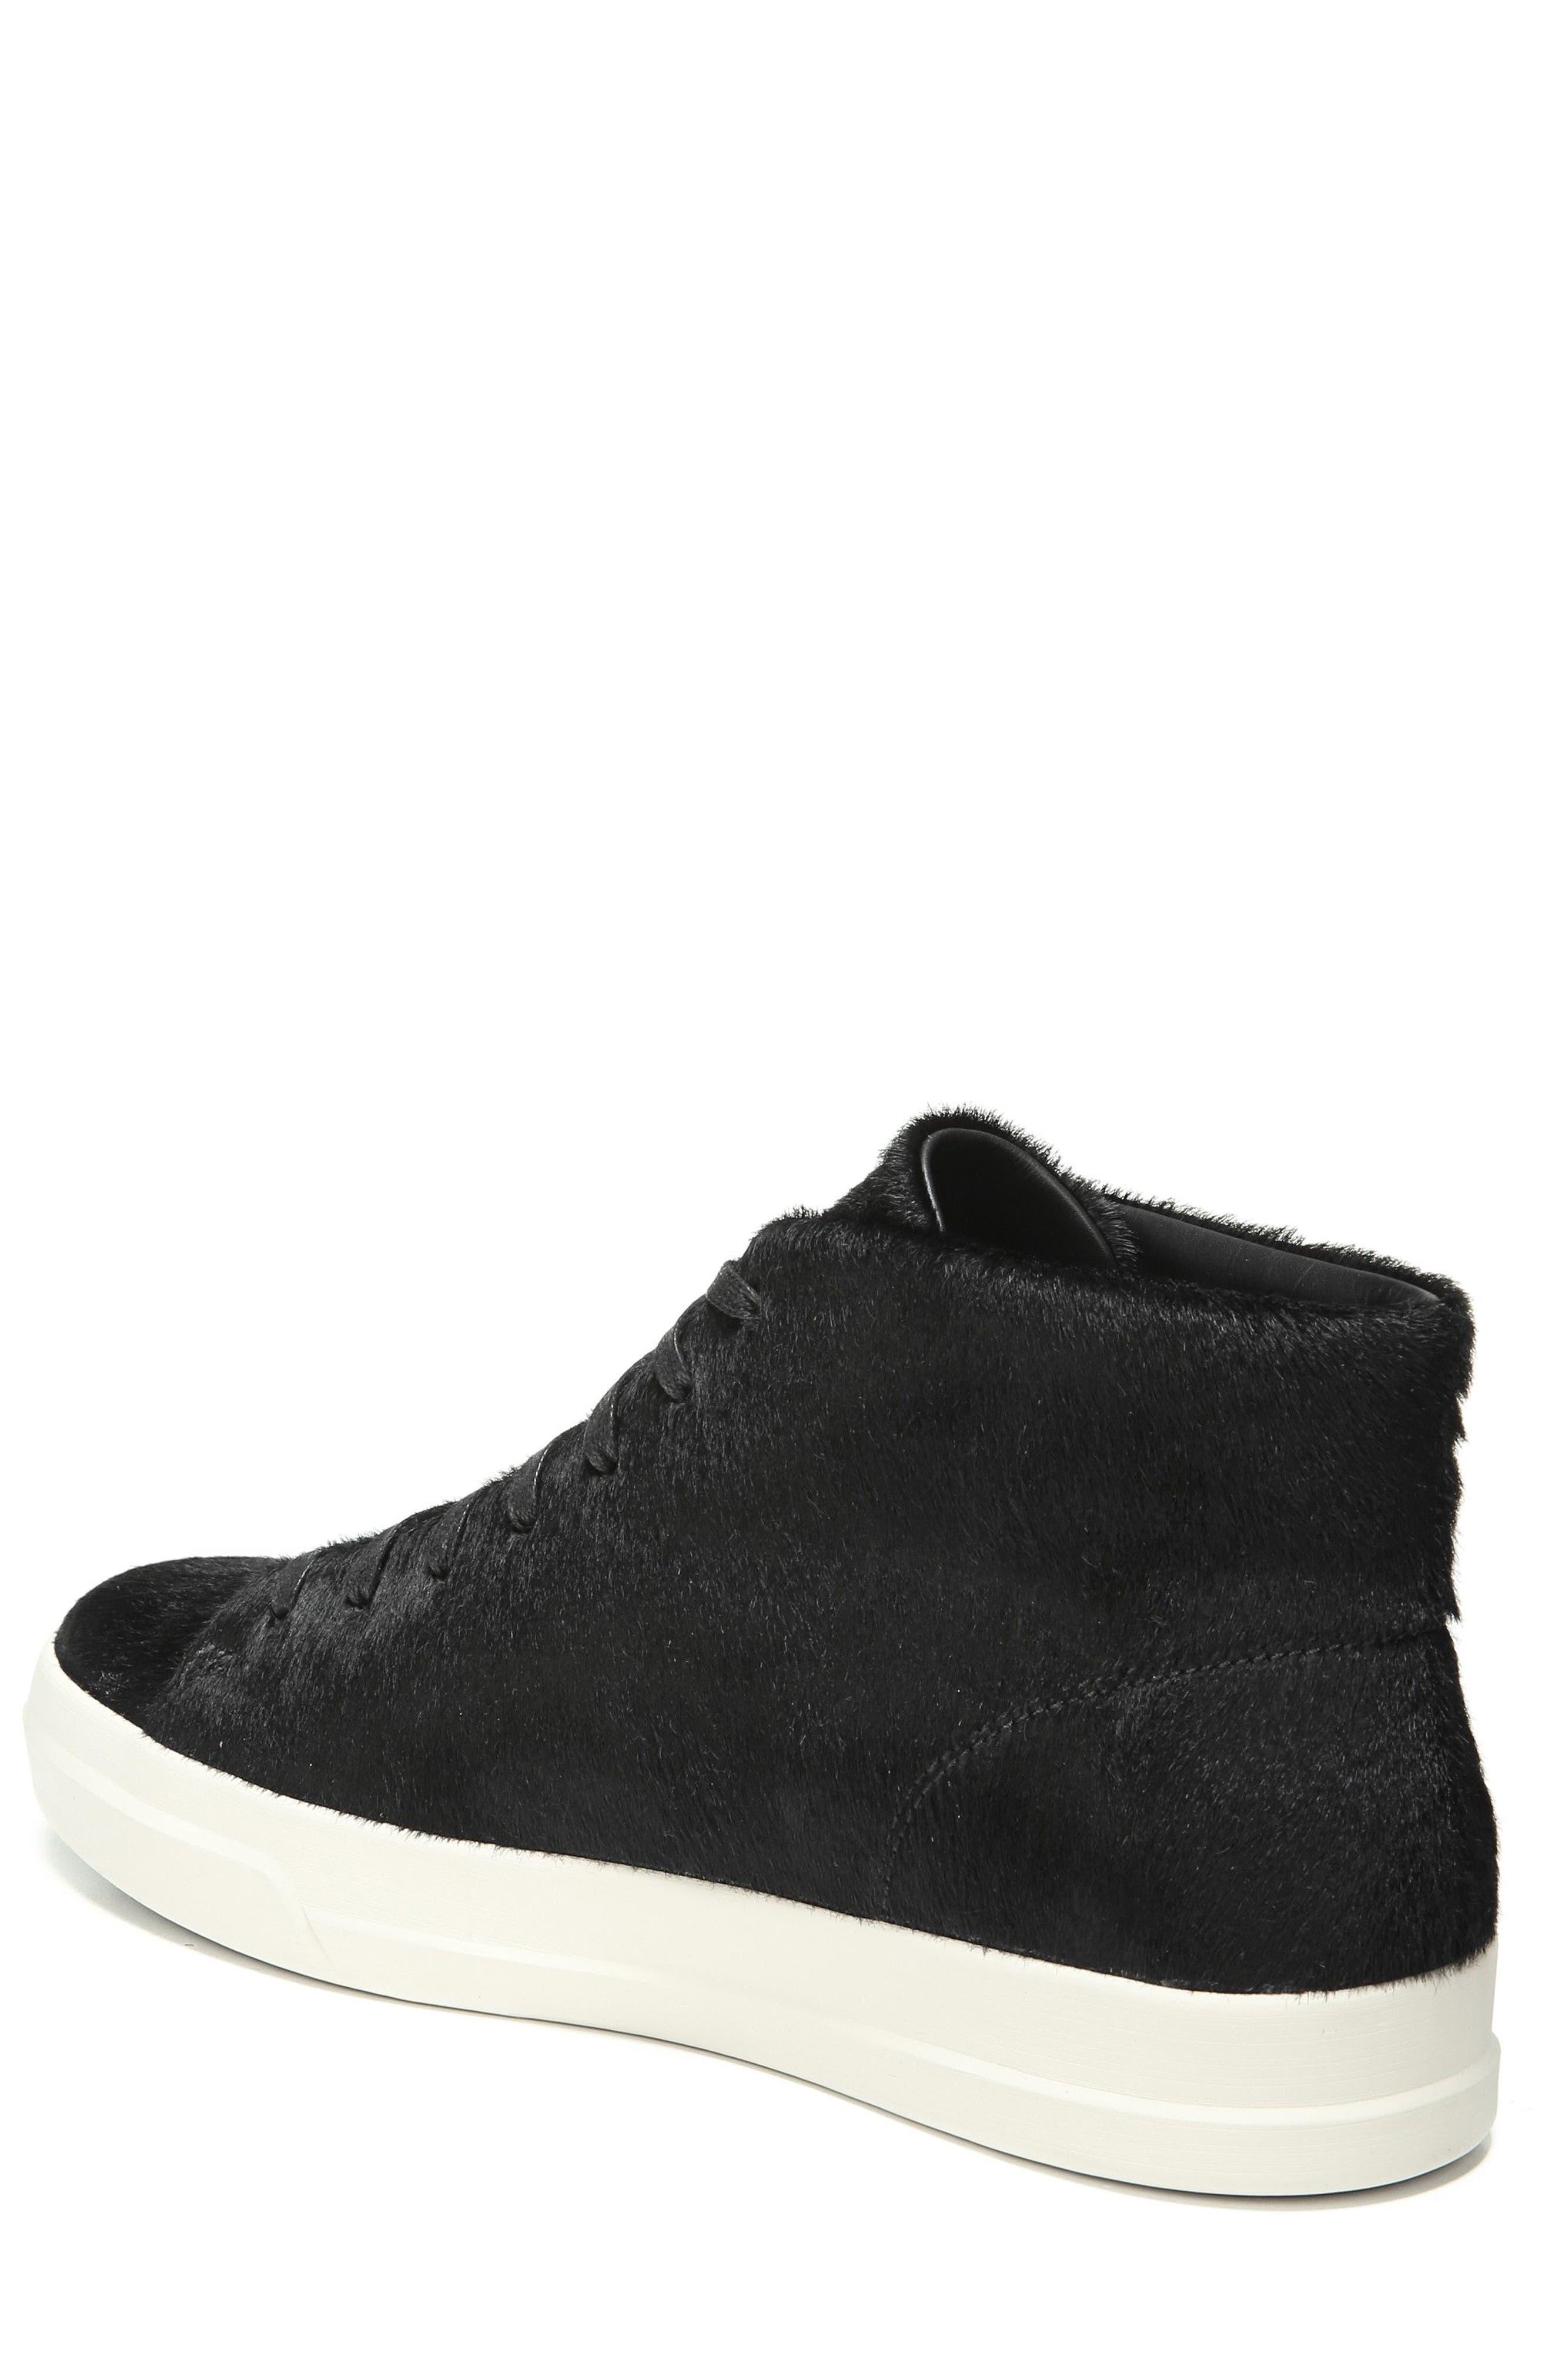 Cullen Sneaker,                             Alternate thumbnail 2, color,                             002